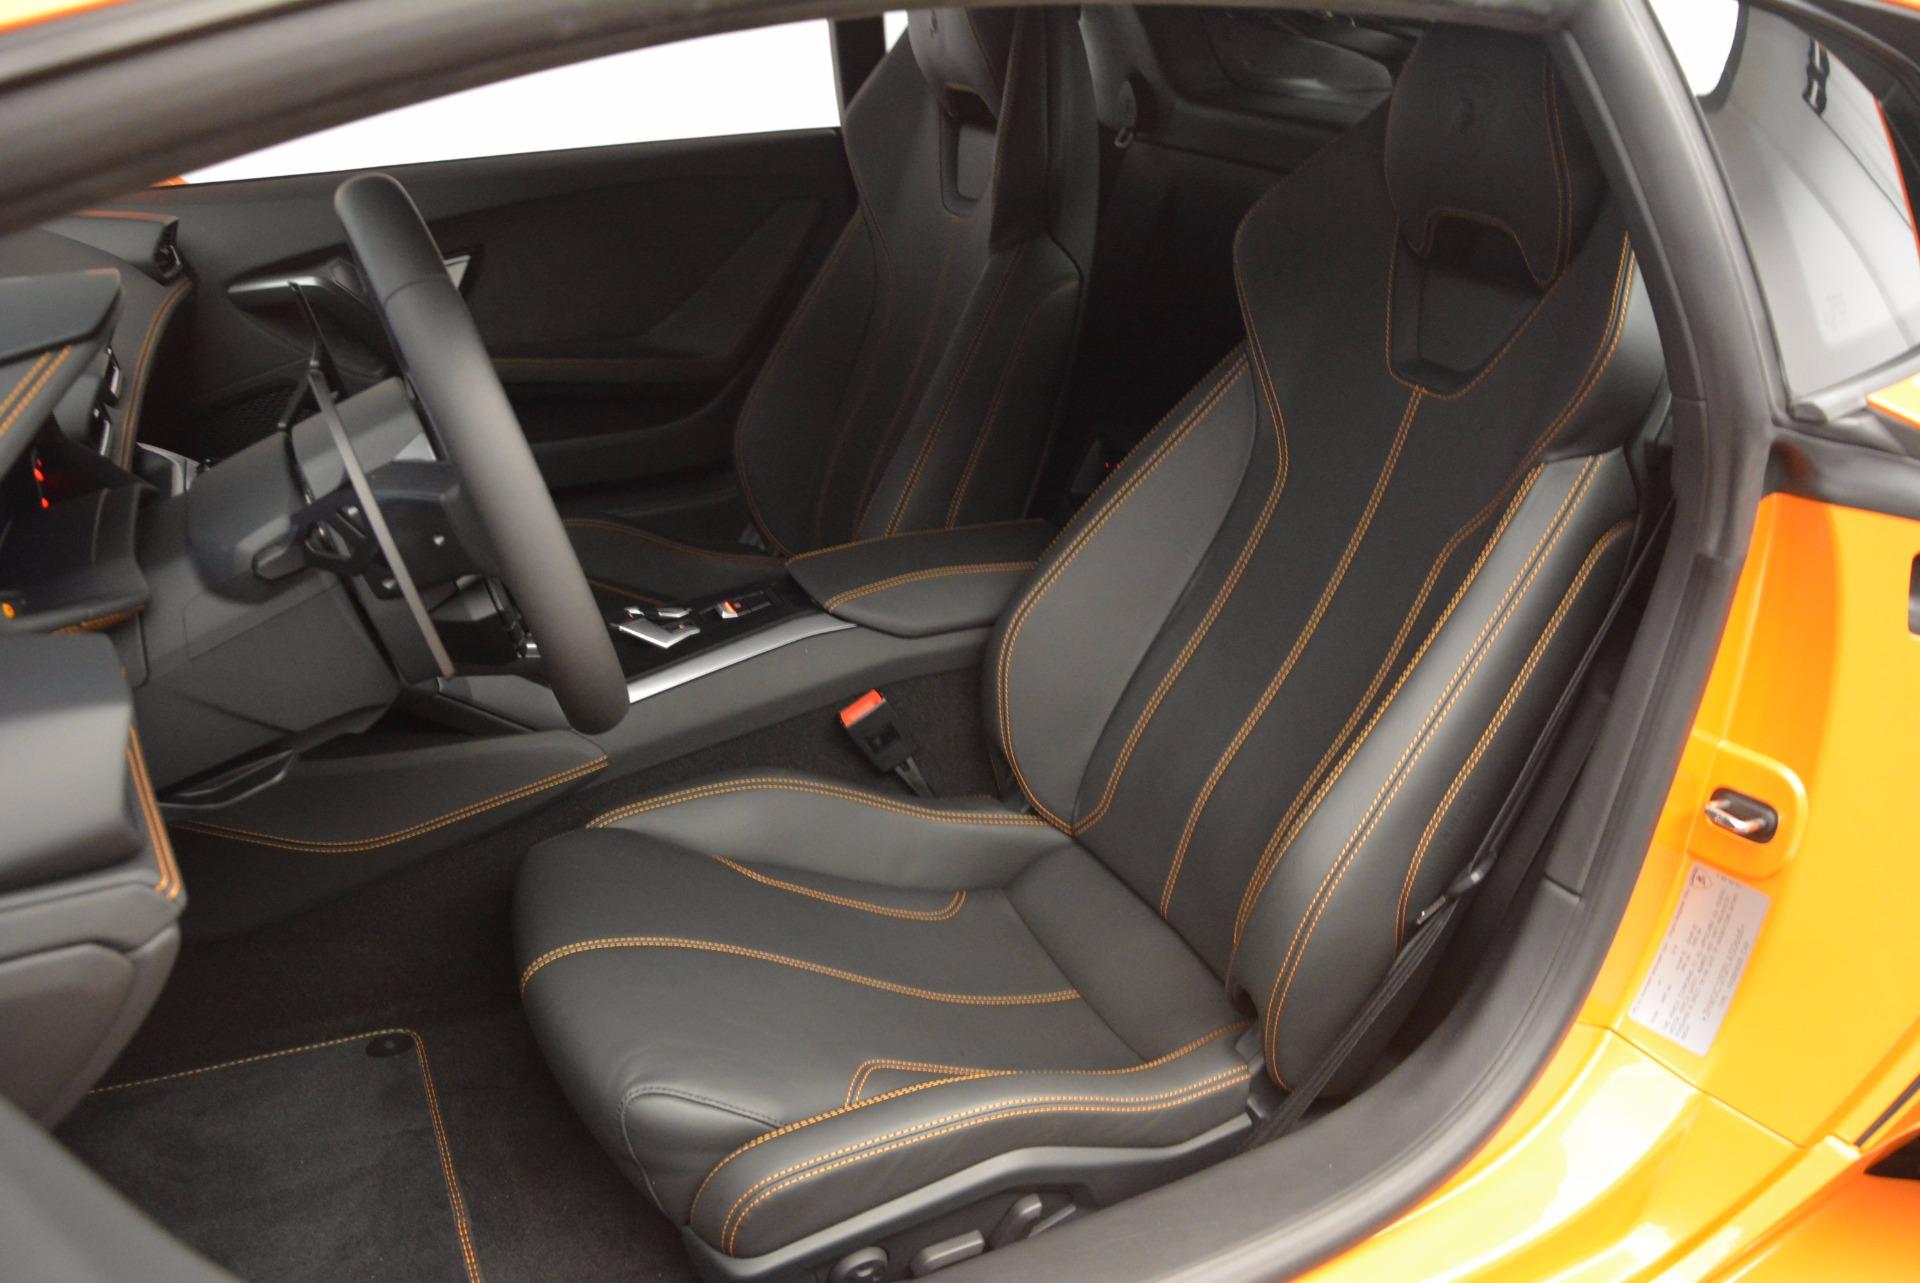 Used 2015 Lamborghini Huracan LP 610-4 For Sale In Greenwich, CT 621_p15